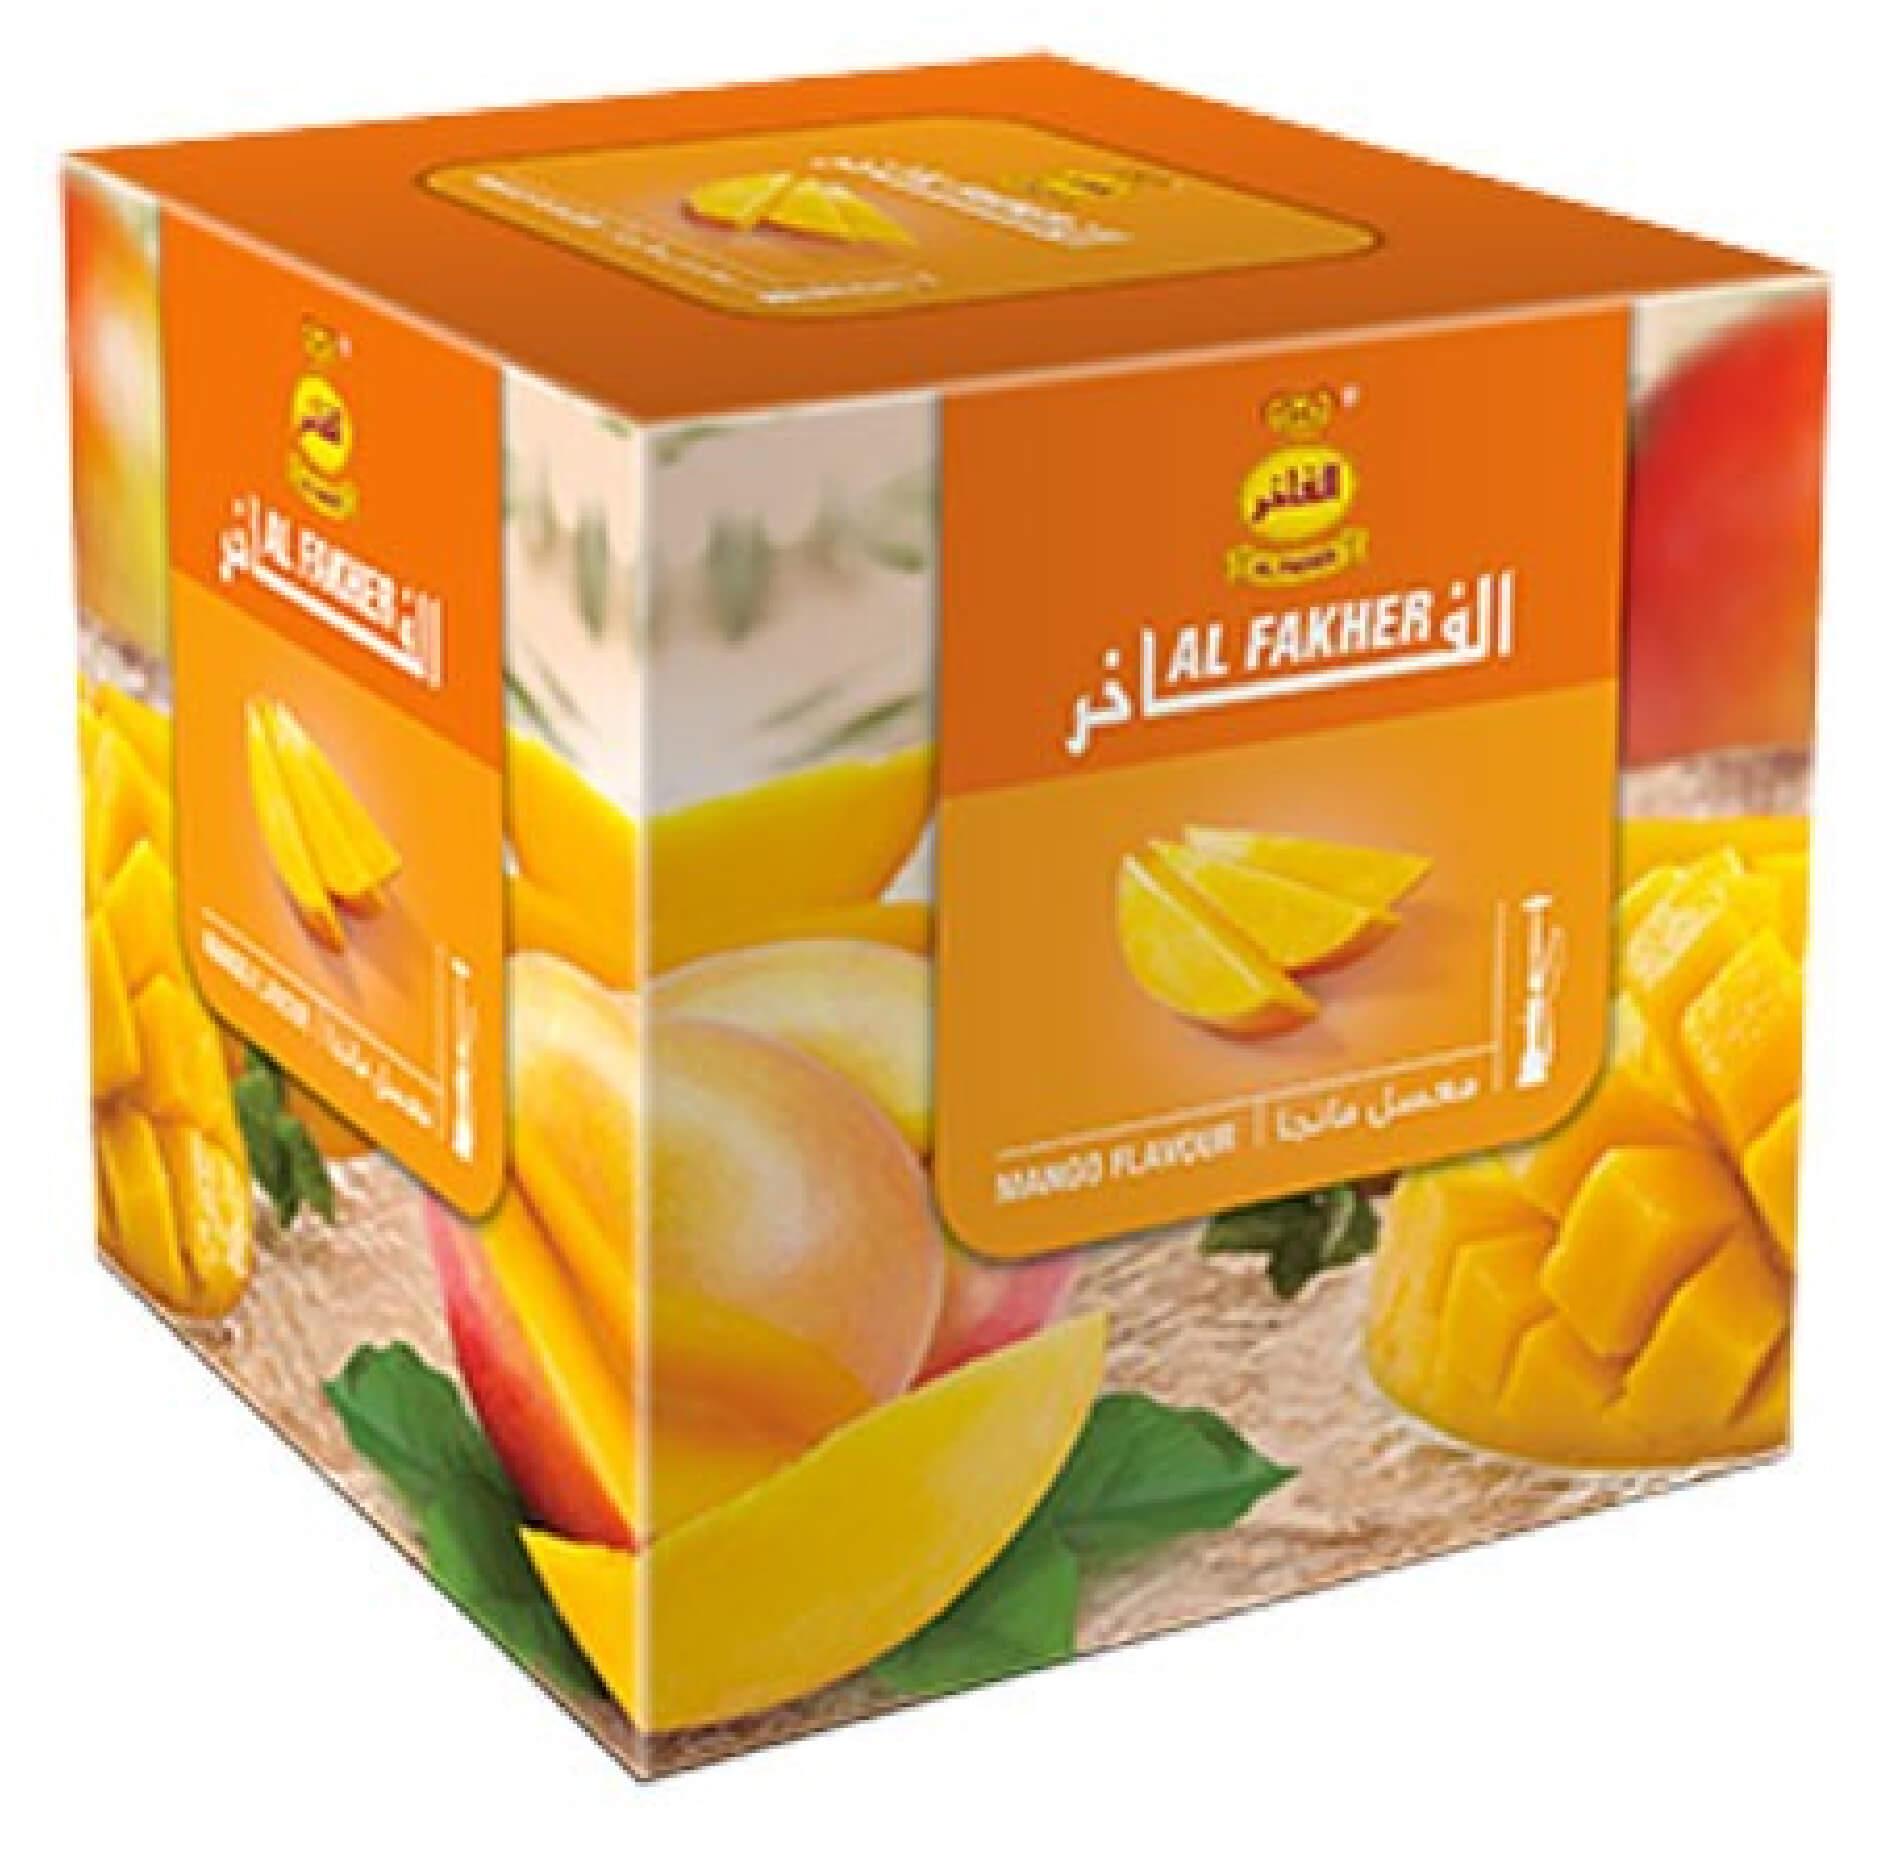 Al-Fakher Mango Best Shisha Falvors